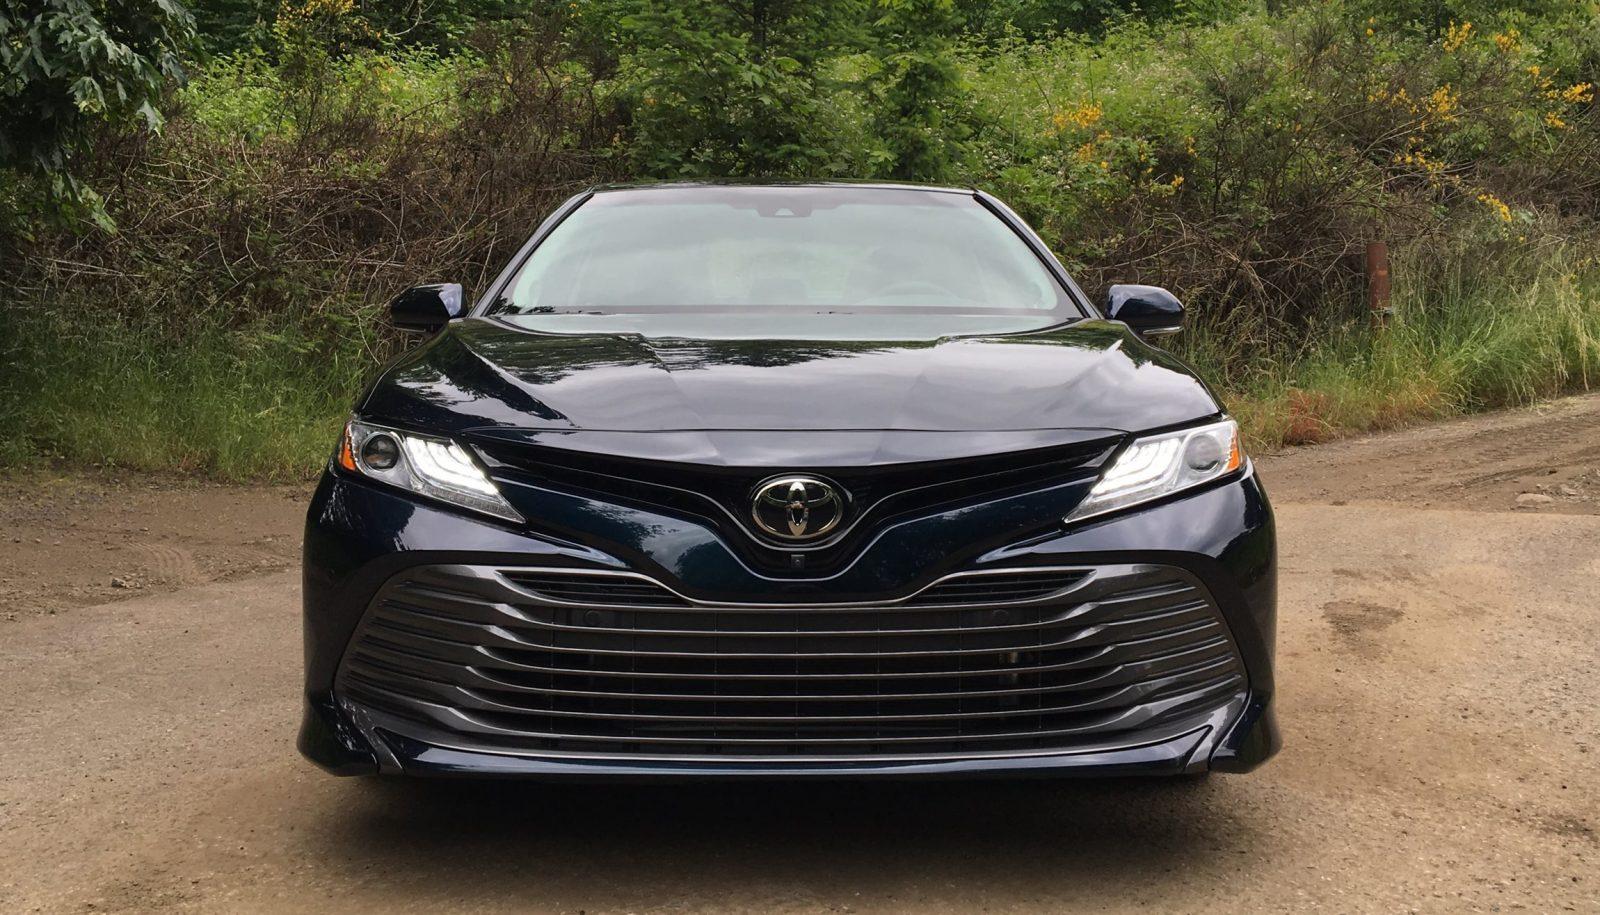 2016 Toyota Camry Xse >> 2018 Toyota Camry XLE By Zeid Nasser 2